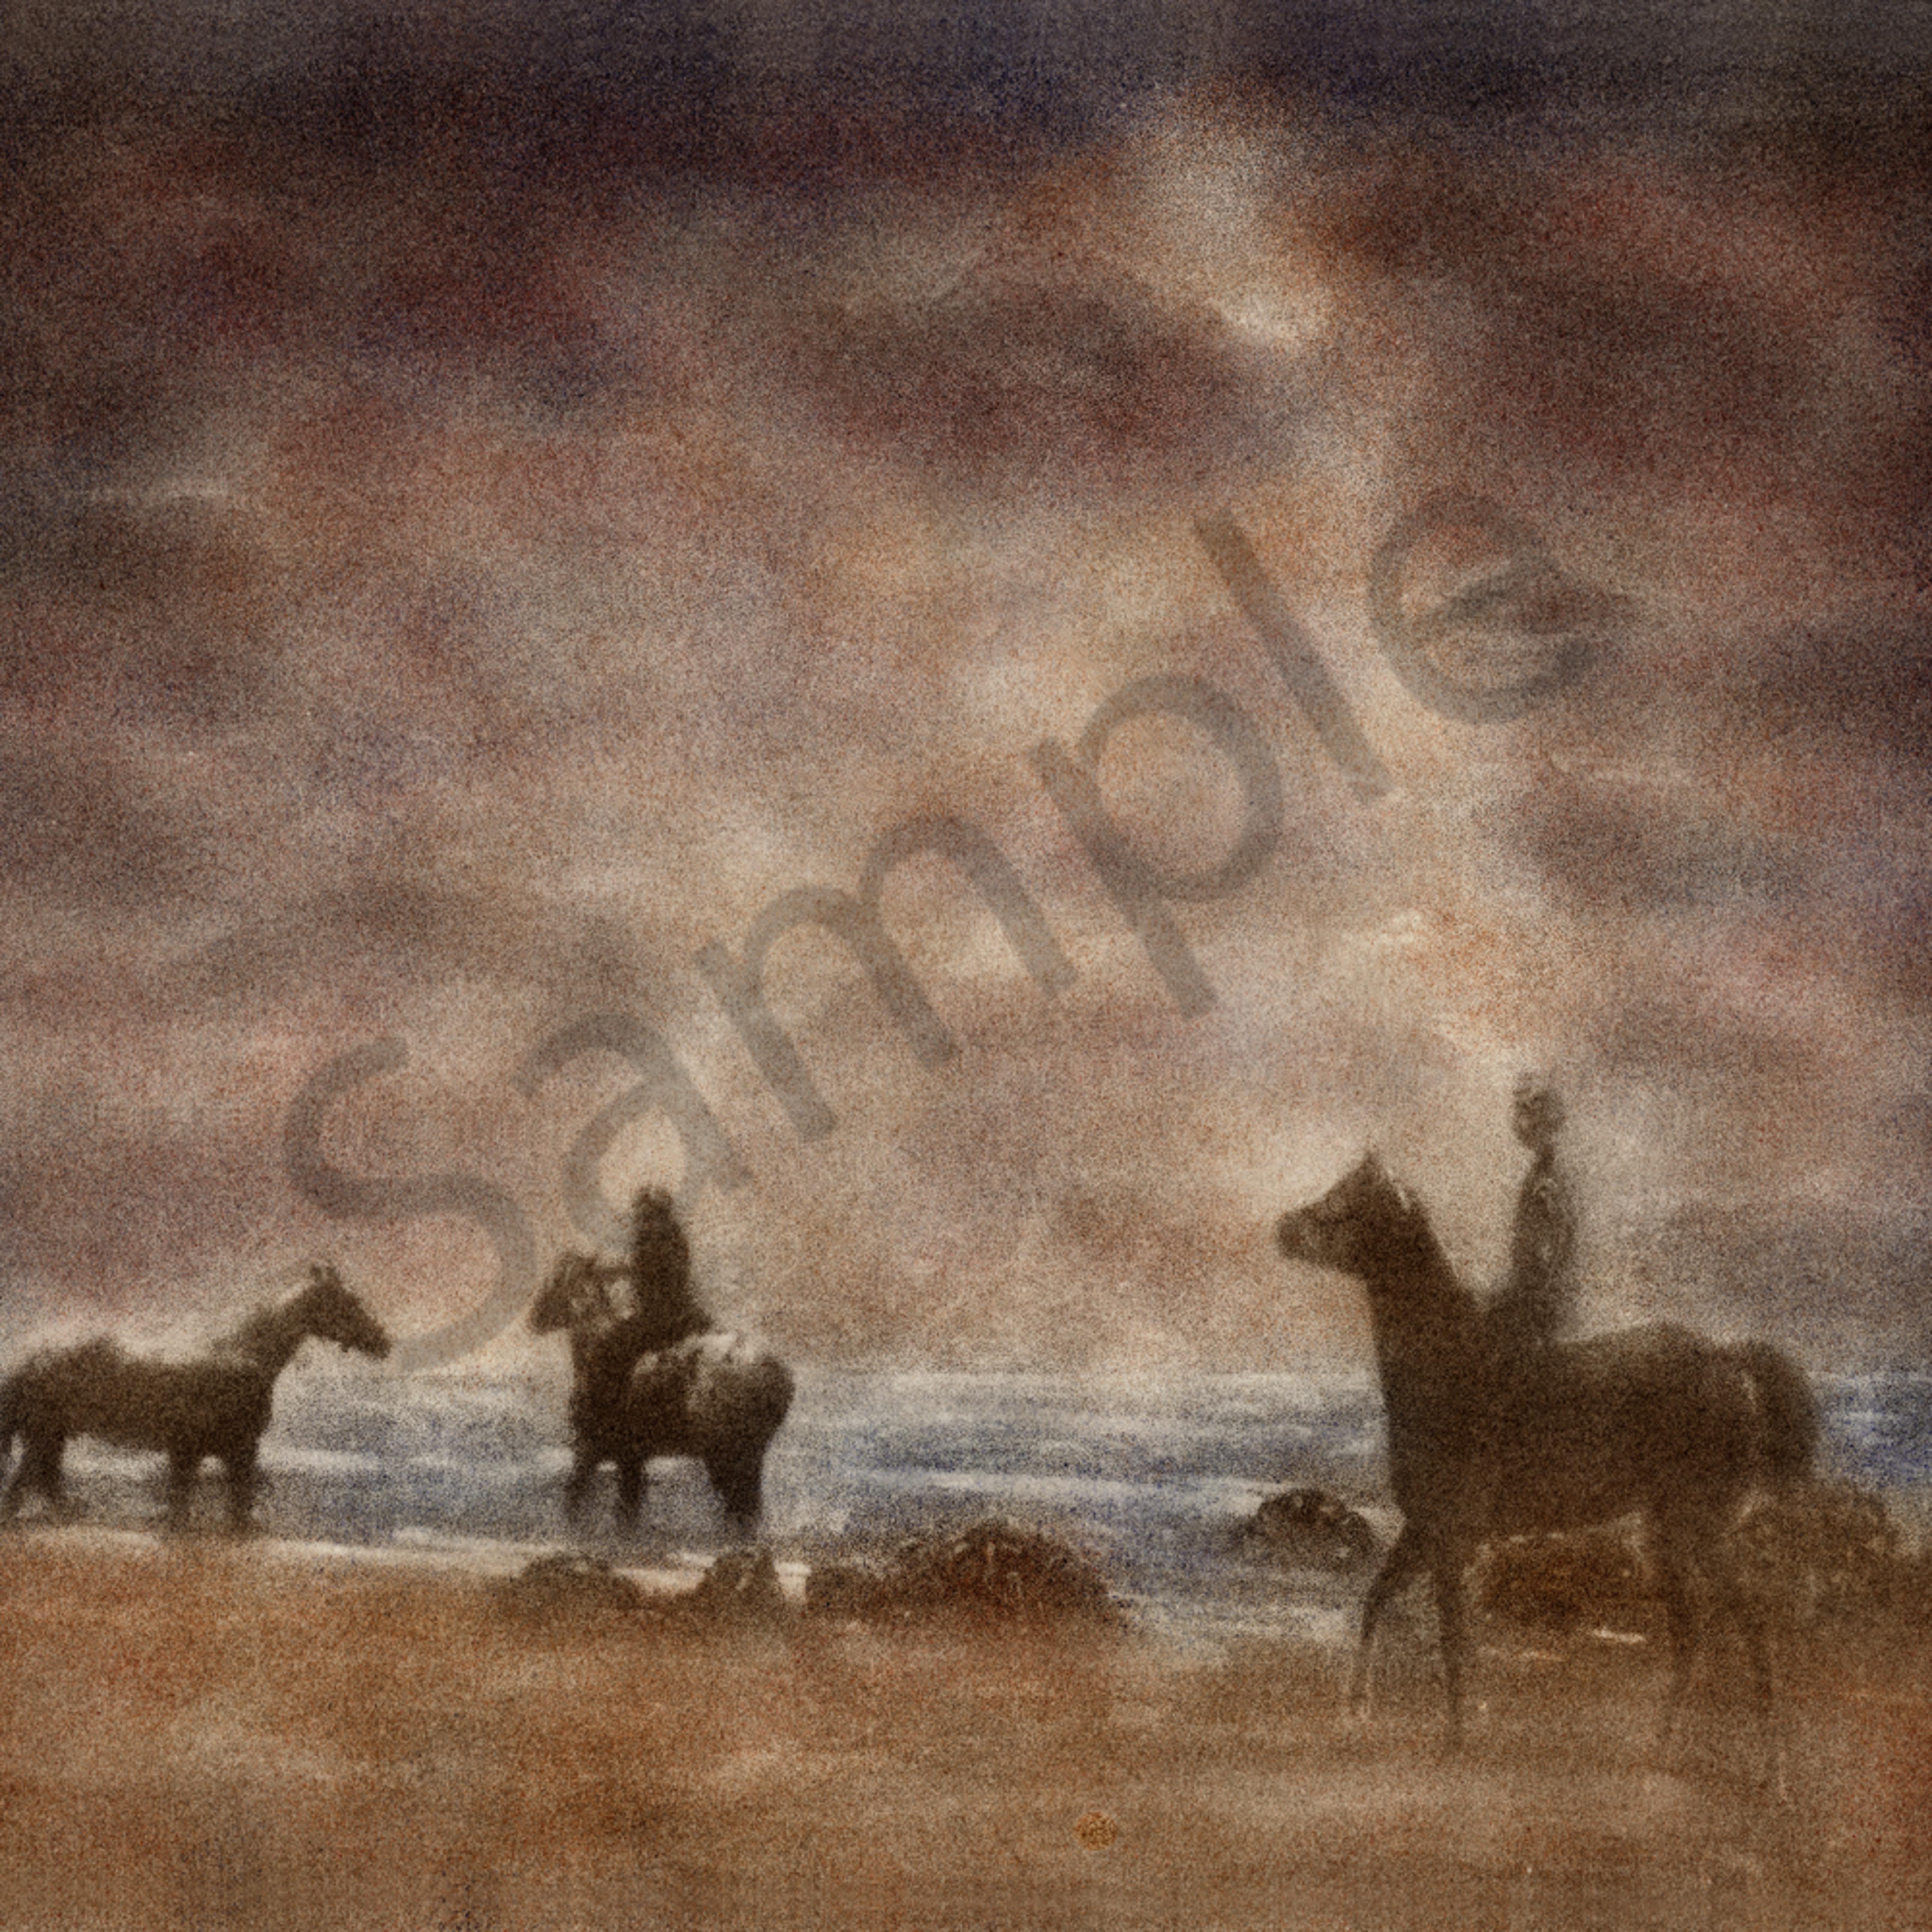 Horse riding on the beach gy97ui